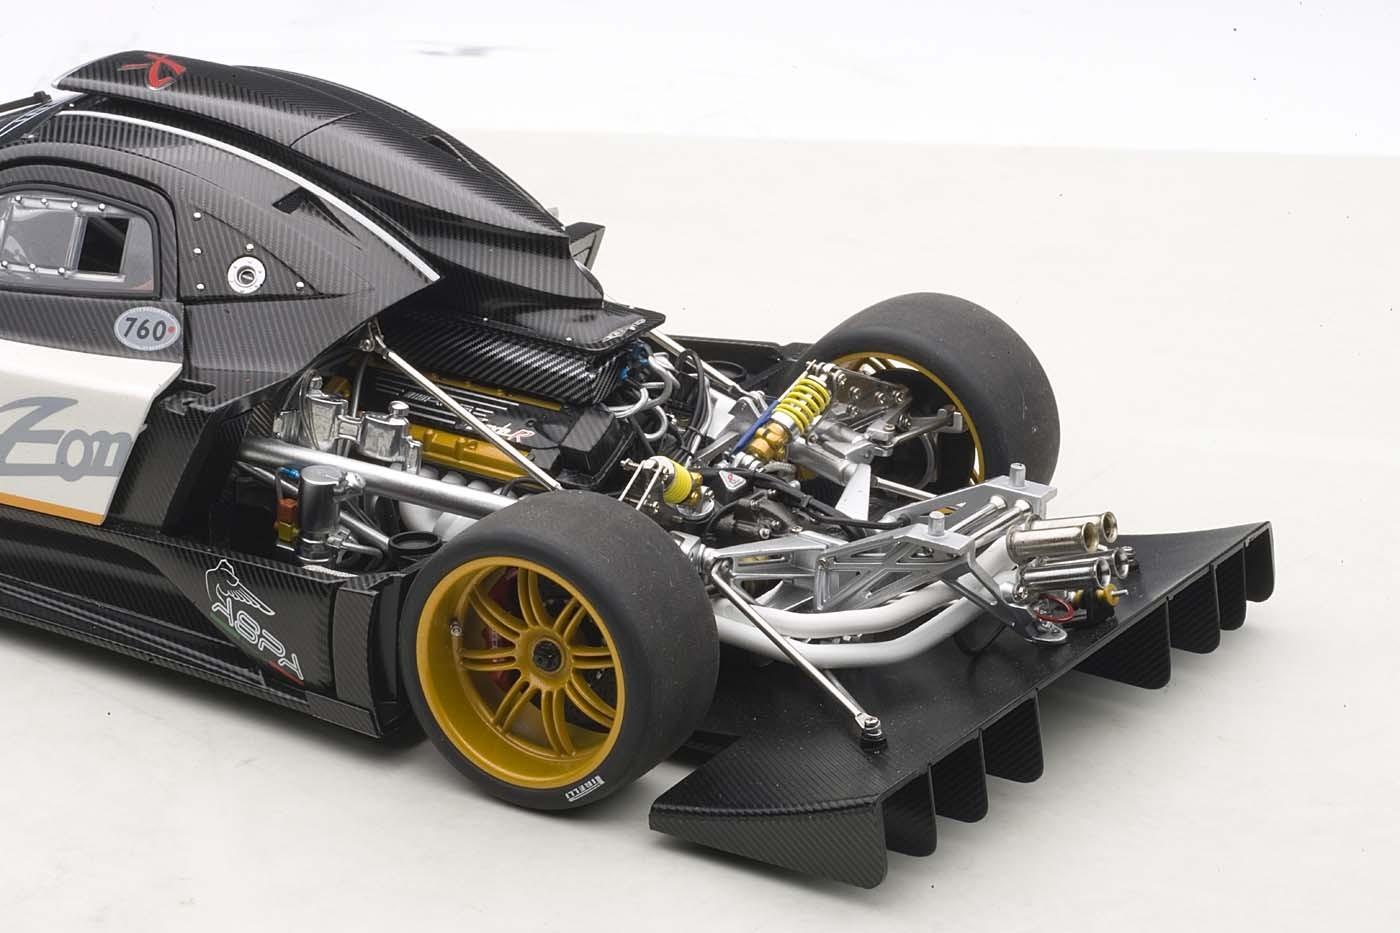 Pagani Huayra For Sale >> AUTOart die-cast model Pagani Zonda R EVO, Carbon Fiber/White 78271 die-cast model in 1:18 scale ...